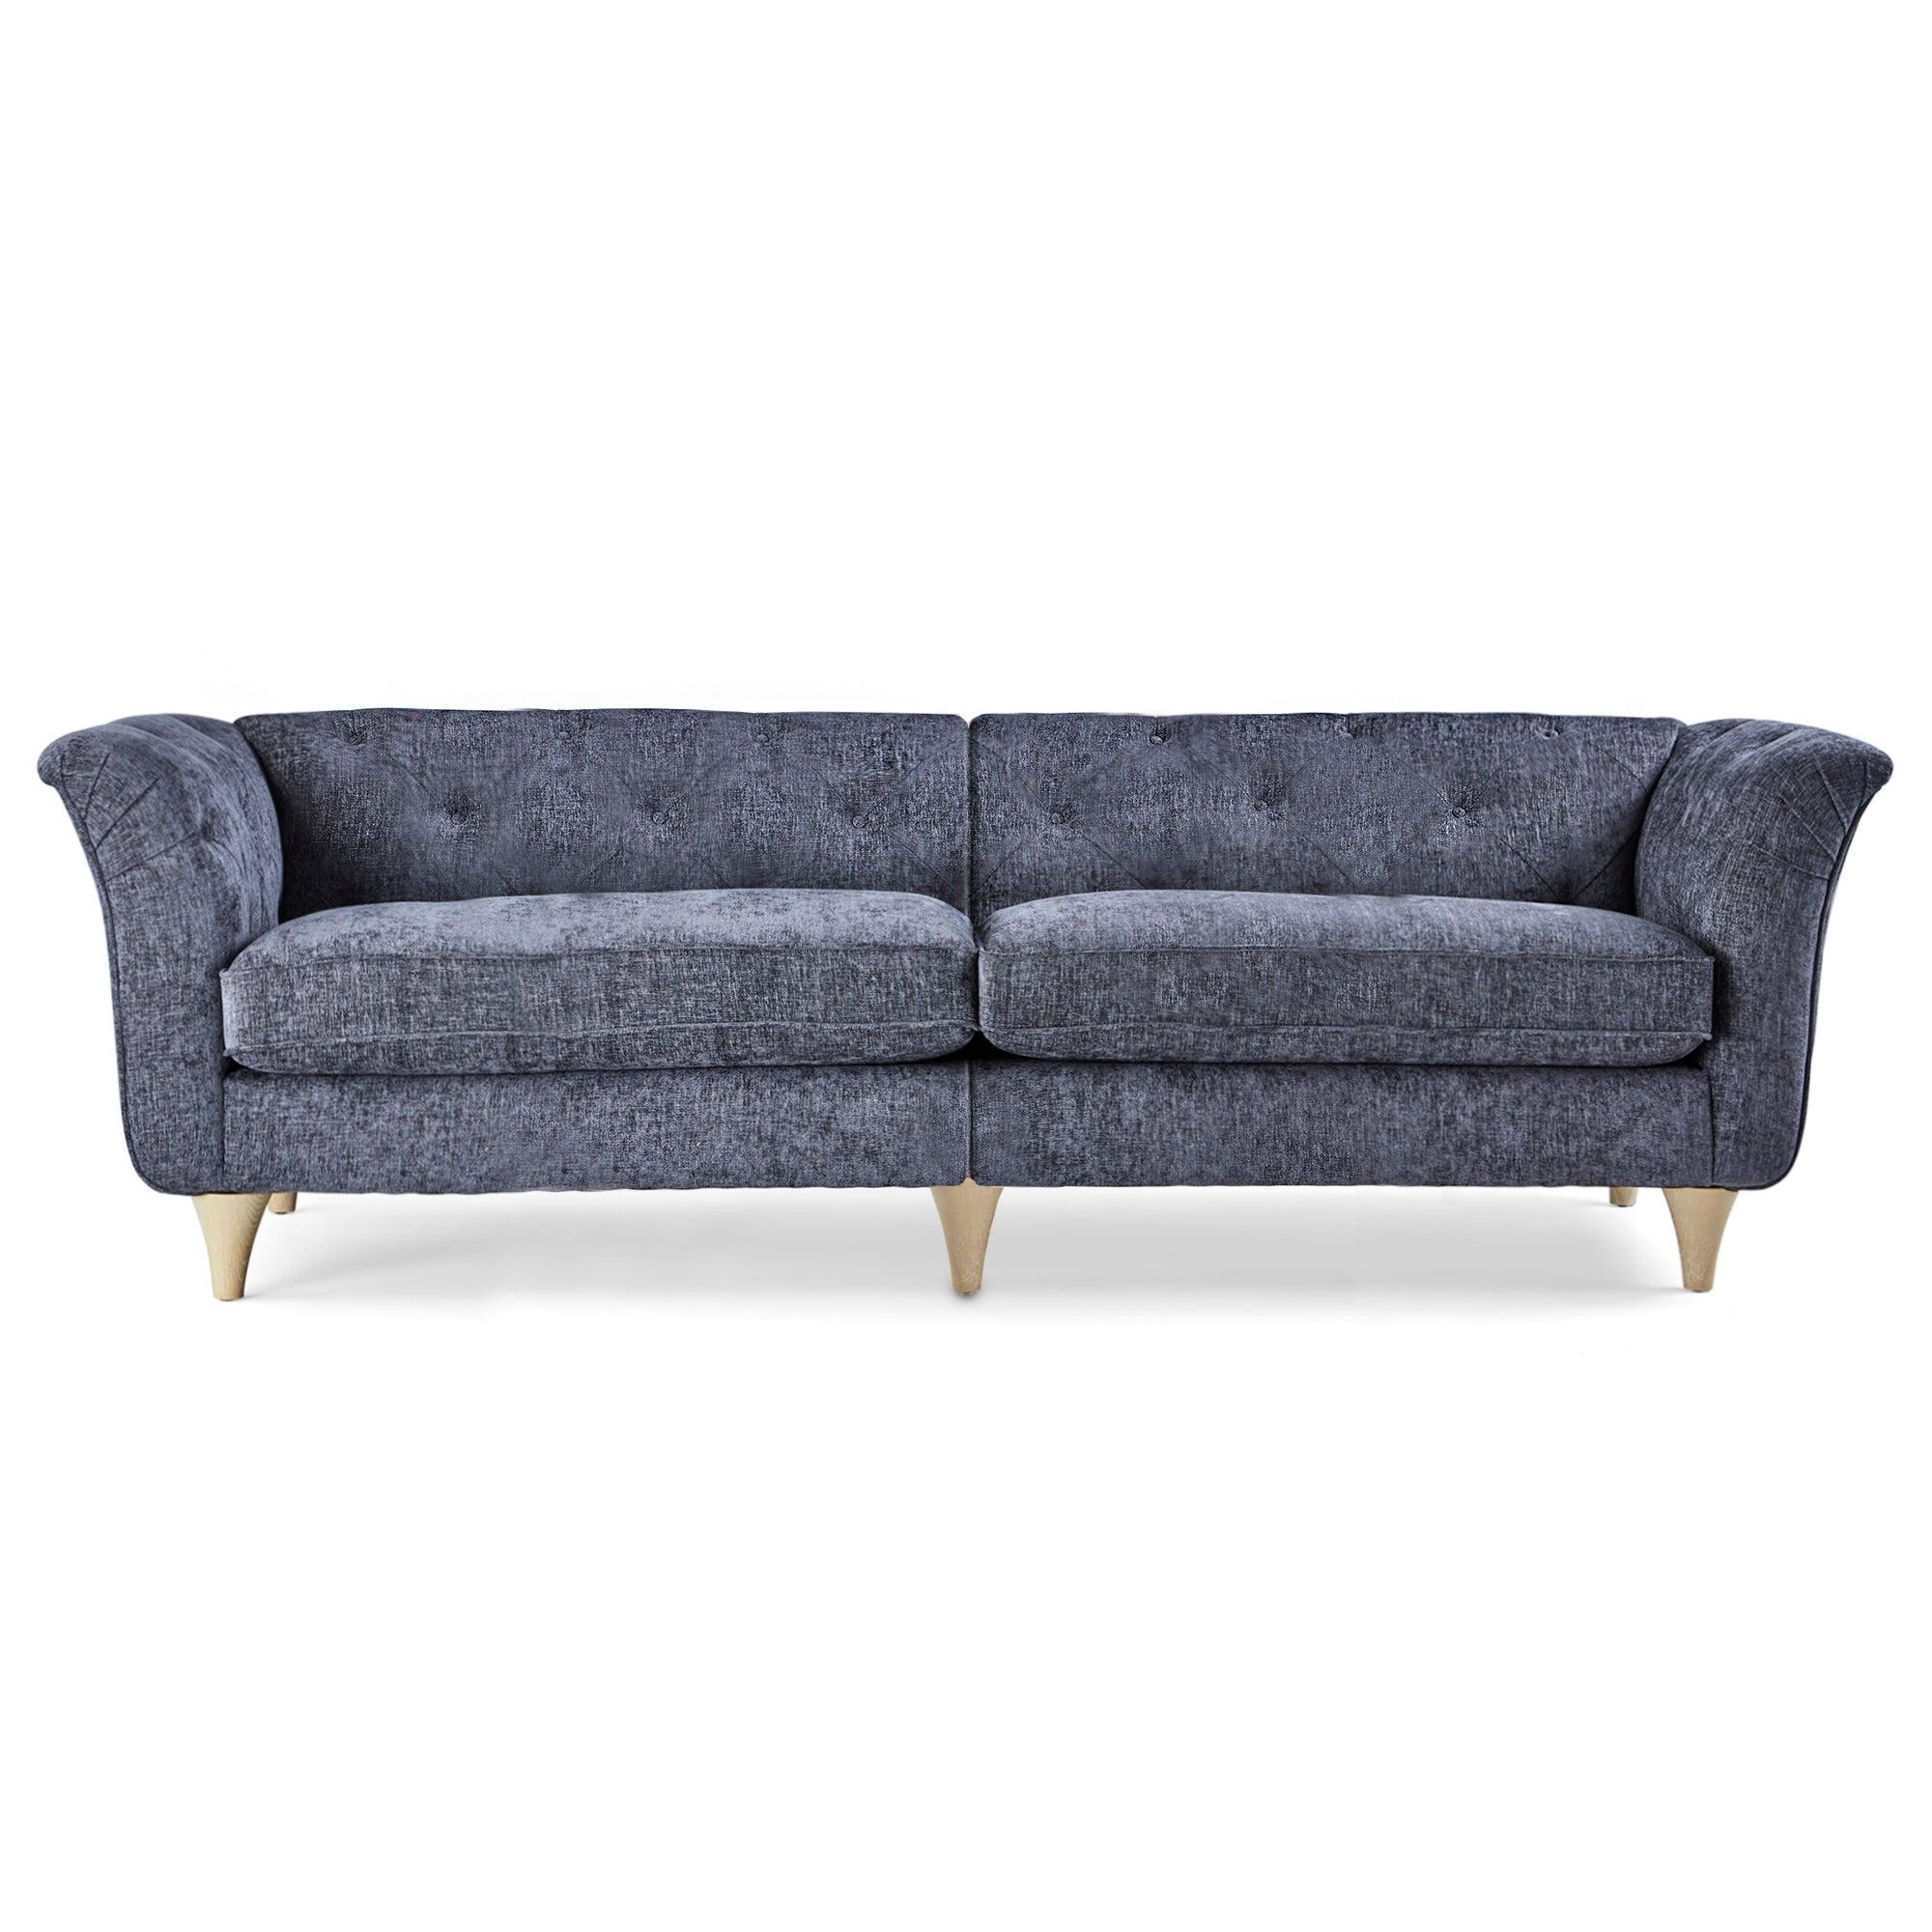 Jaipur 4 Seater Sofa Luxury Chenille Navy Blue